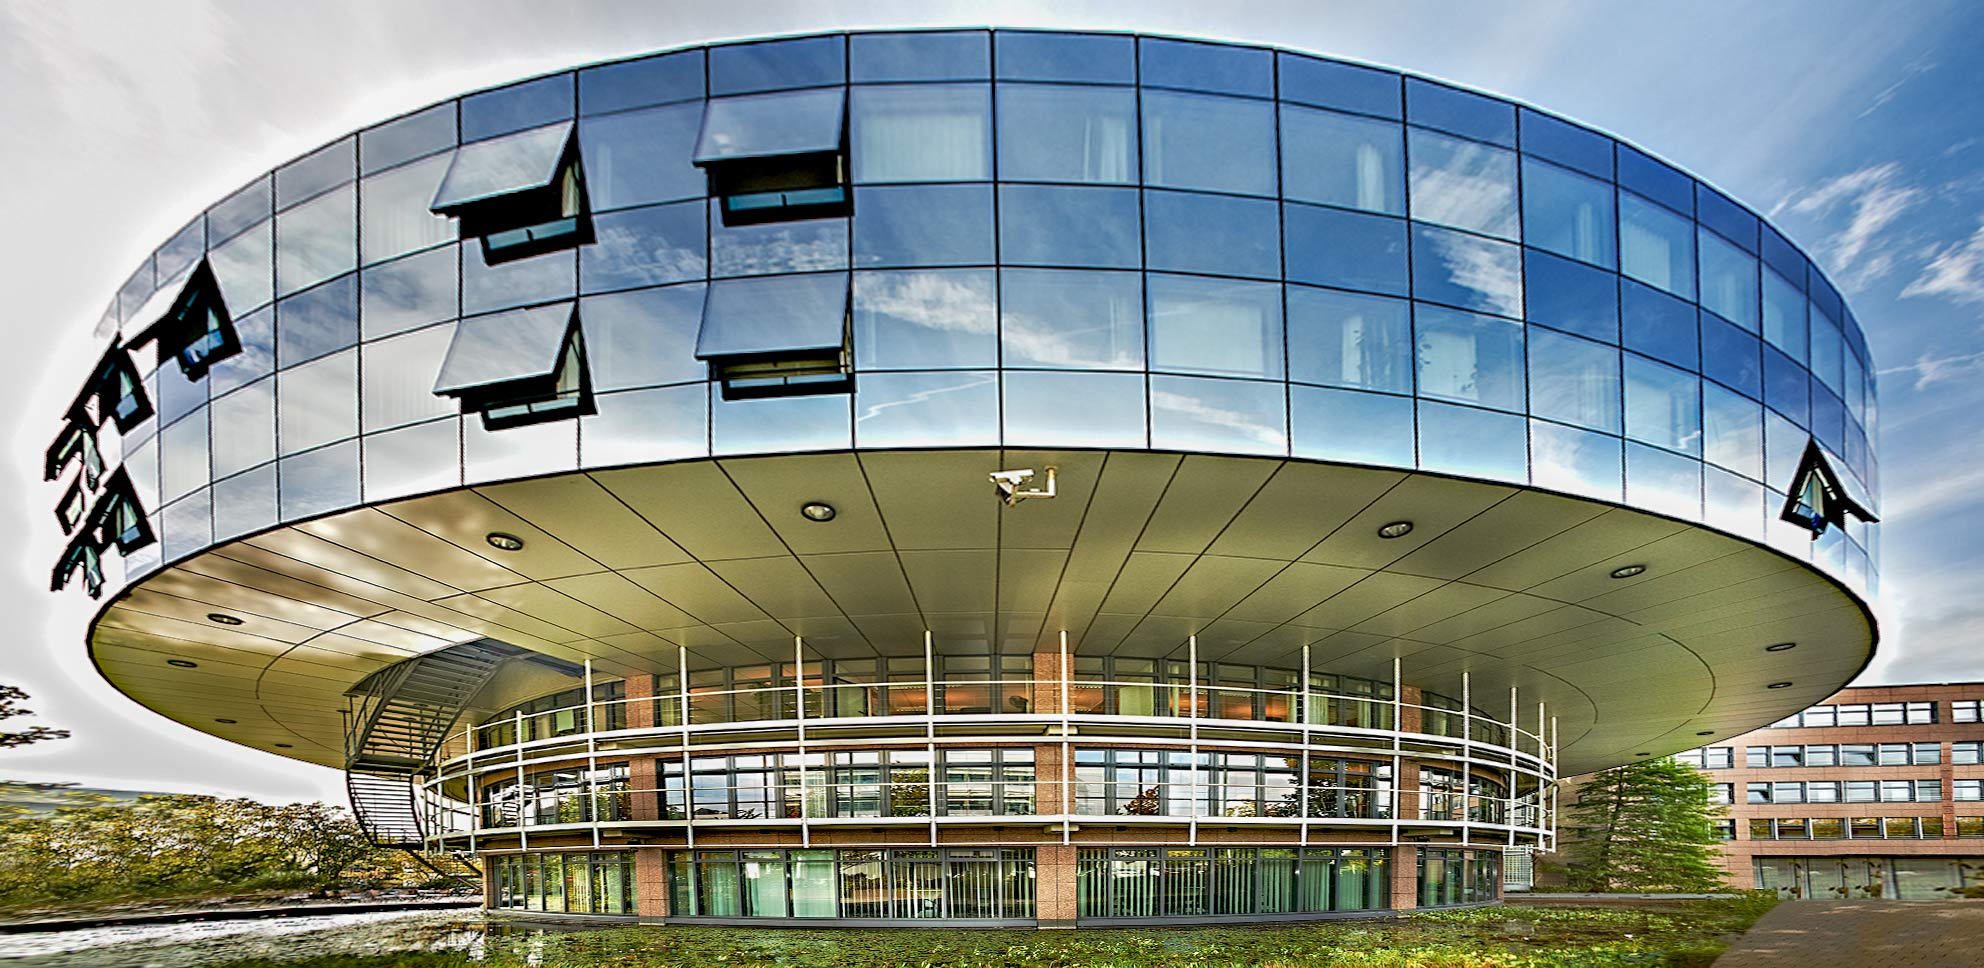 Architekturfotografie Yaph - dzpb - Rotund Luxemburg